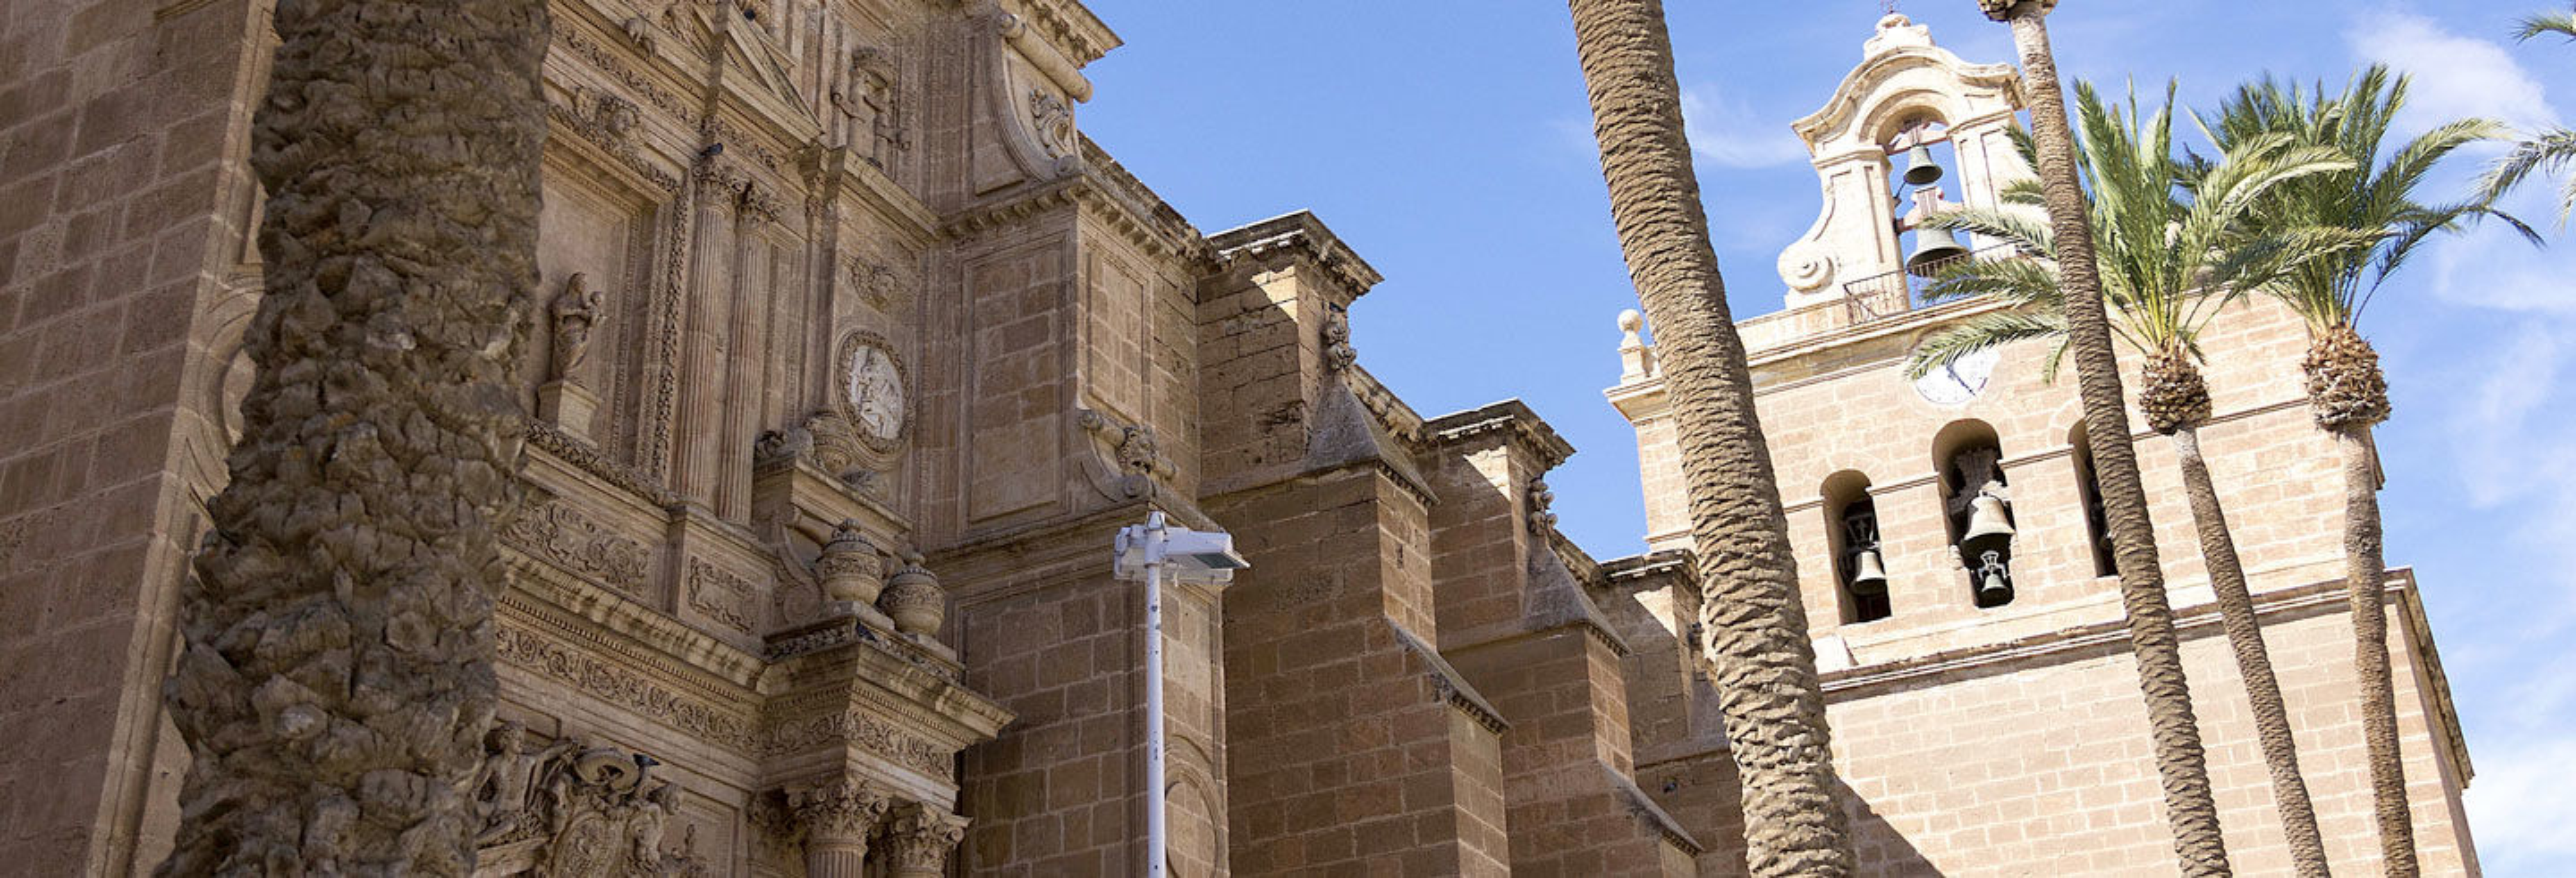 Visita guidata di Almeria